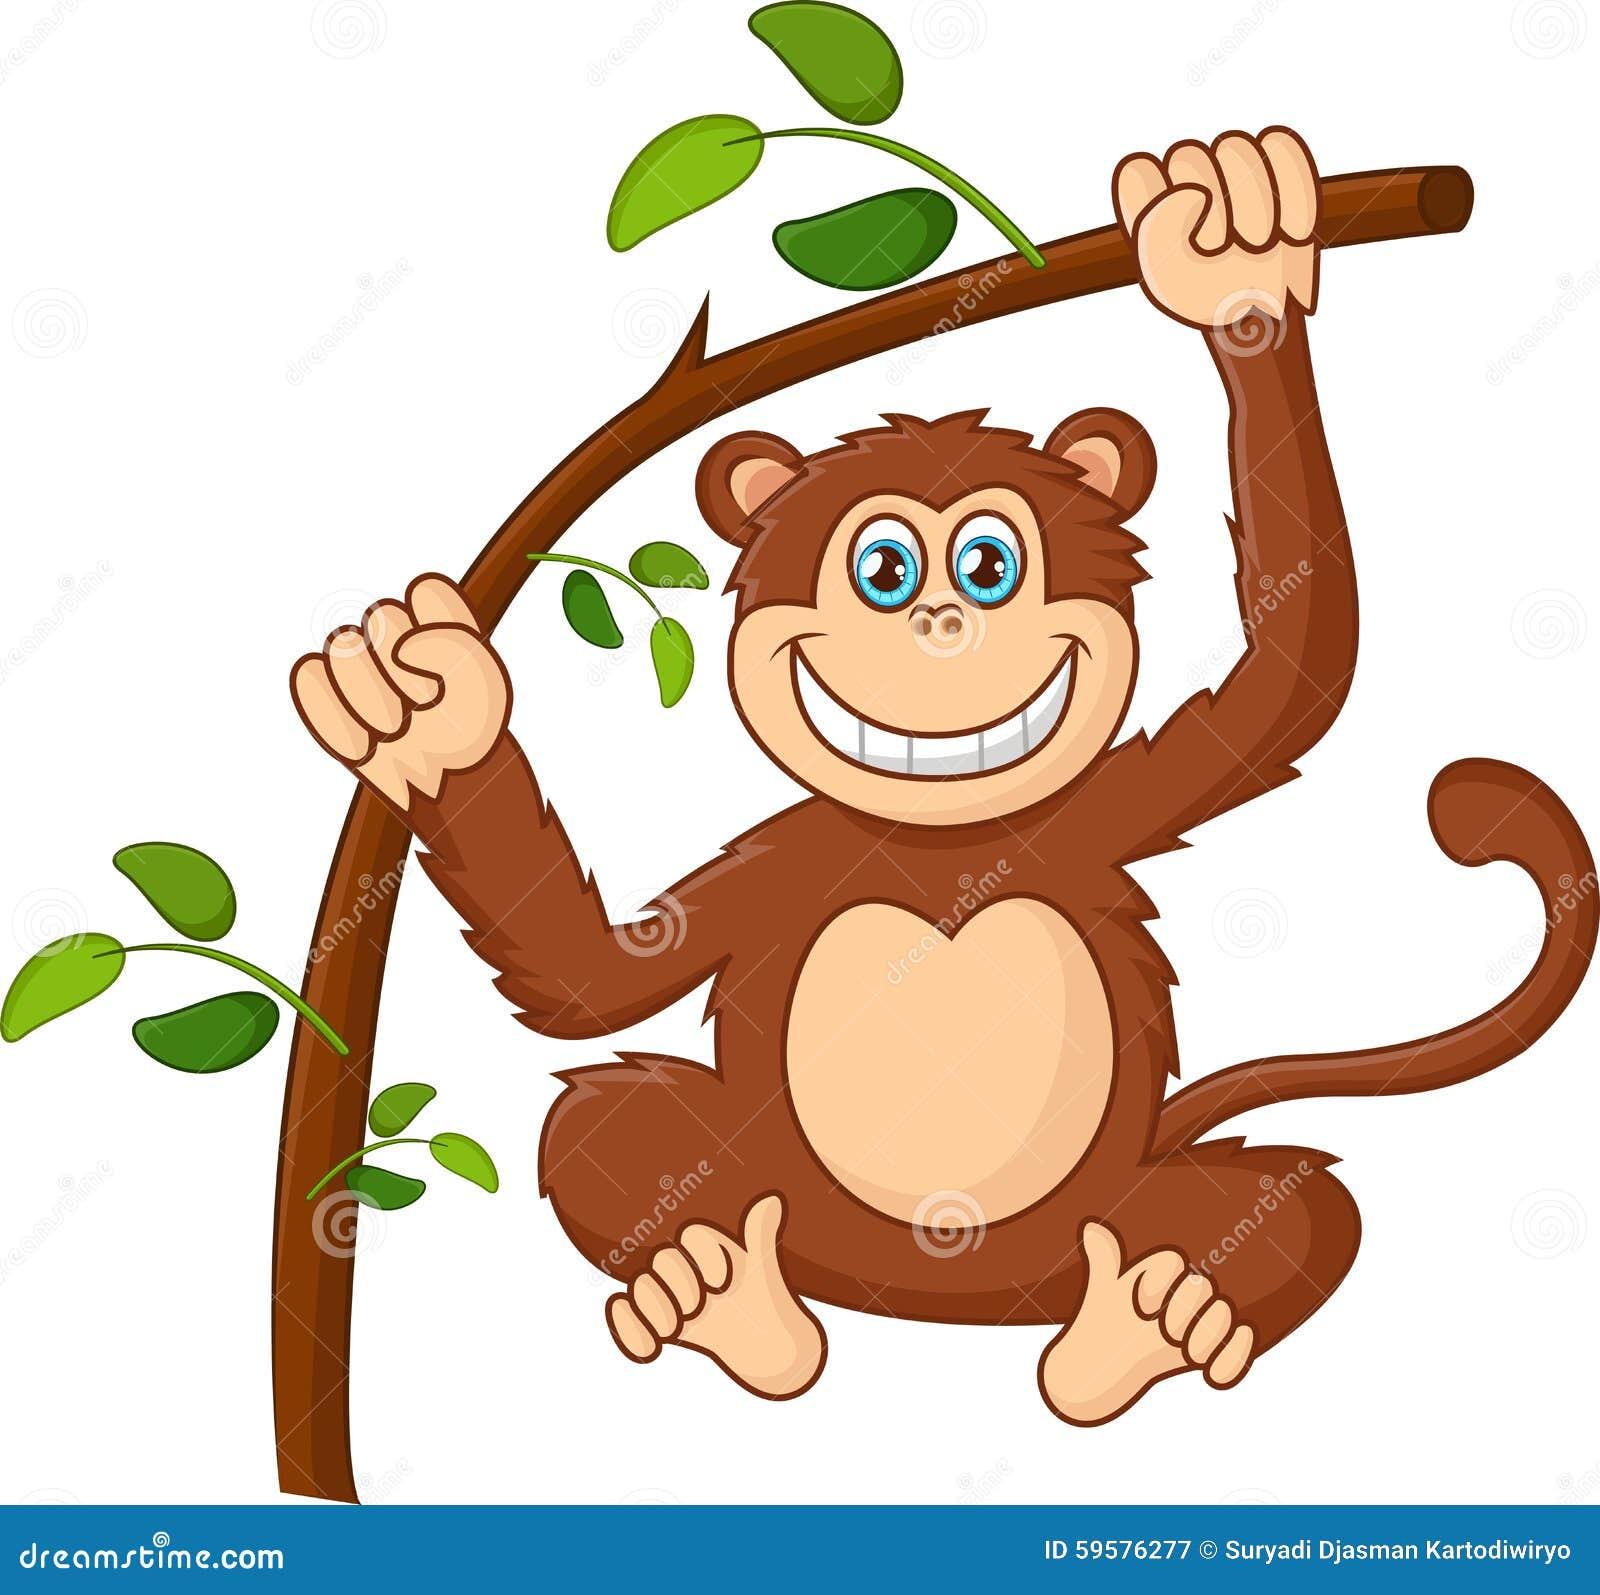 Images for simple cartoon monkey hanging - Cartoon Happy Smile Monkey Hanging